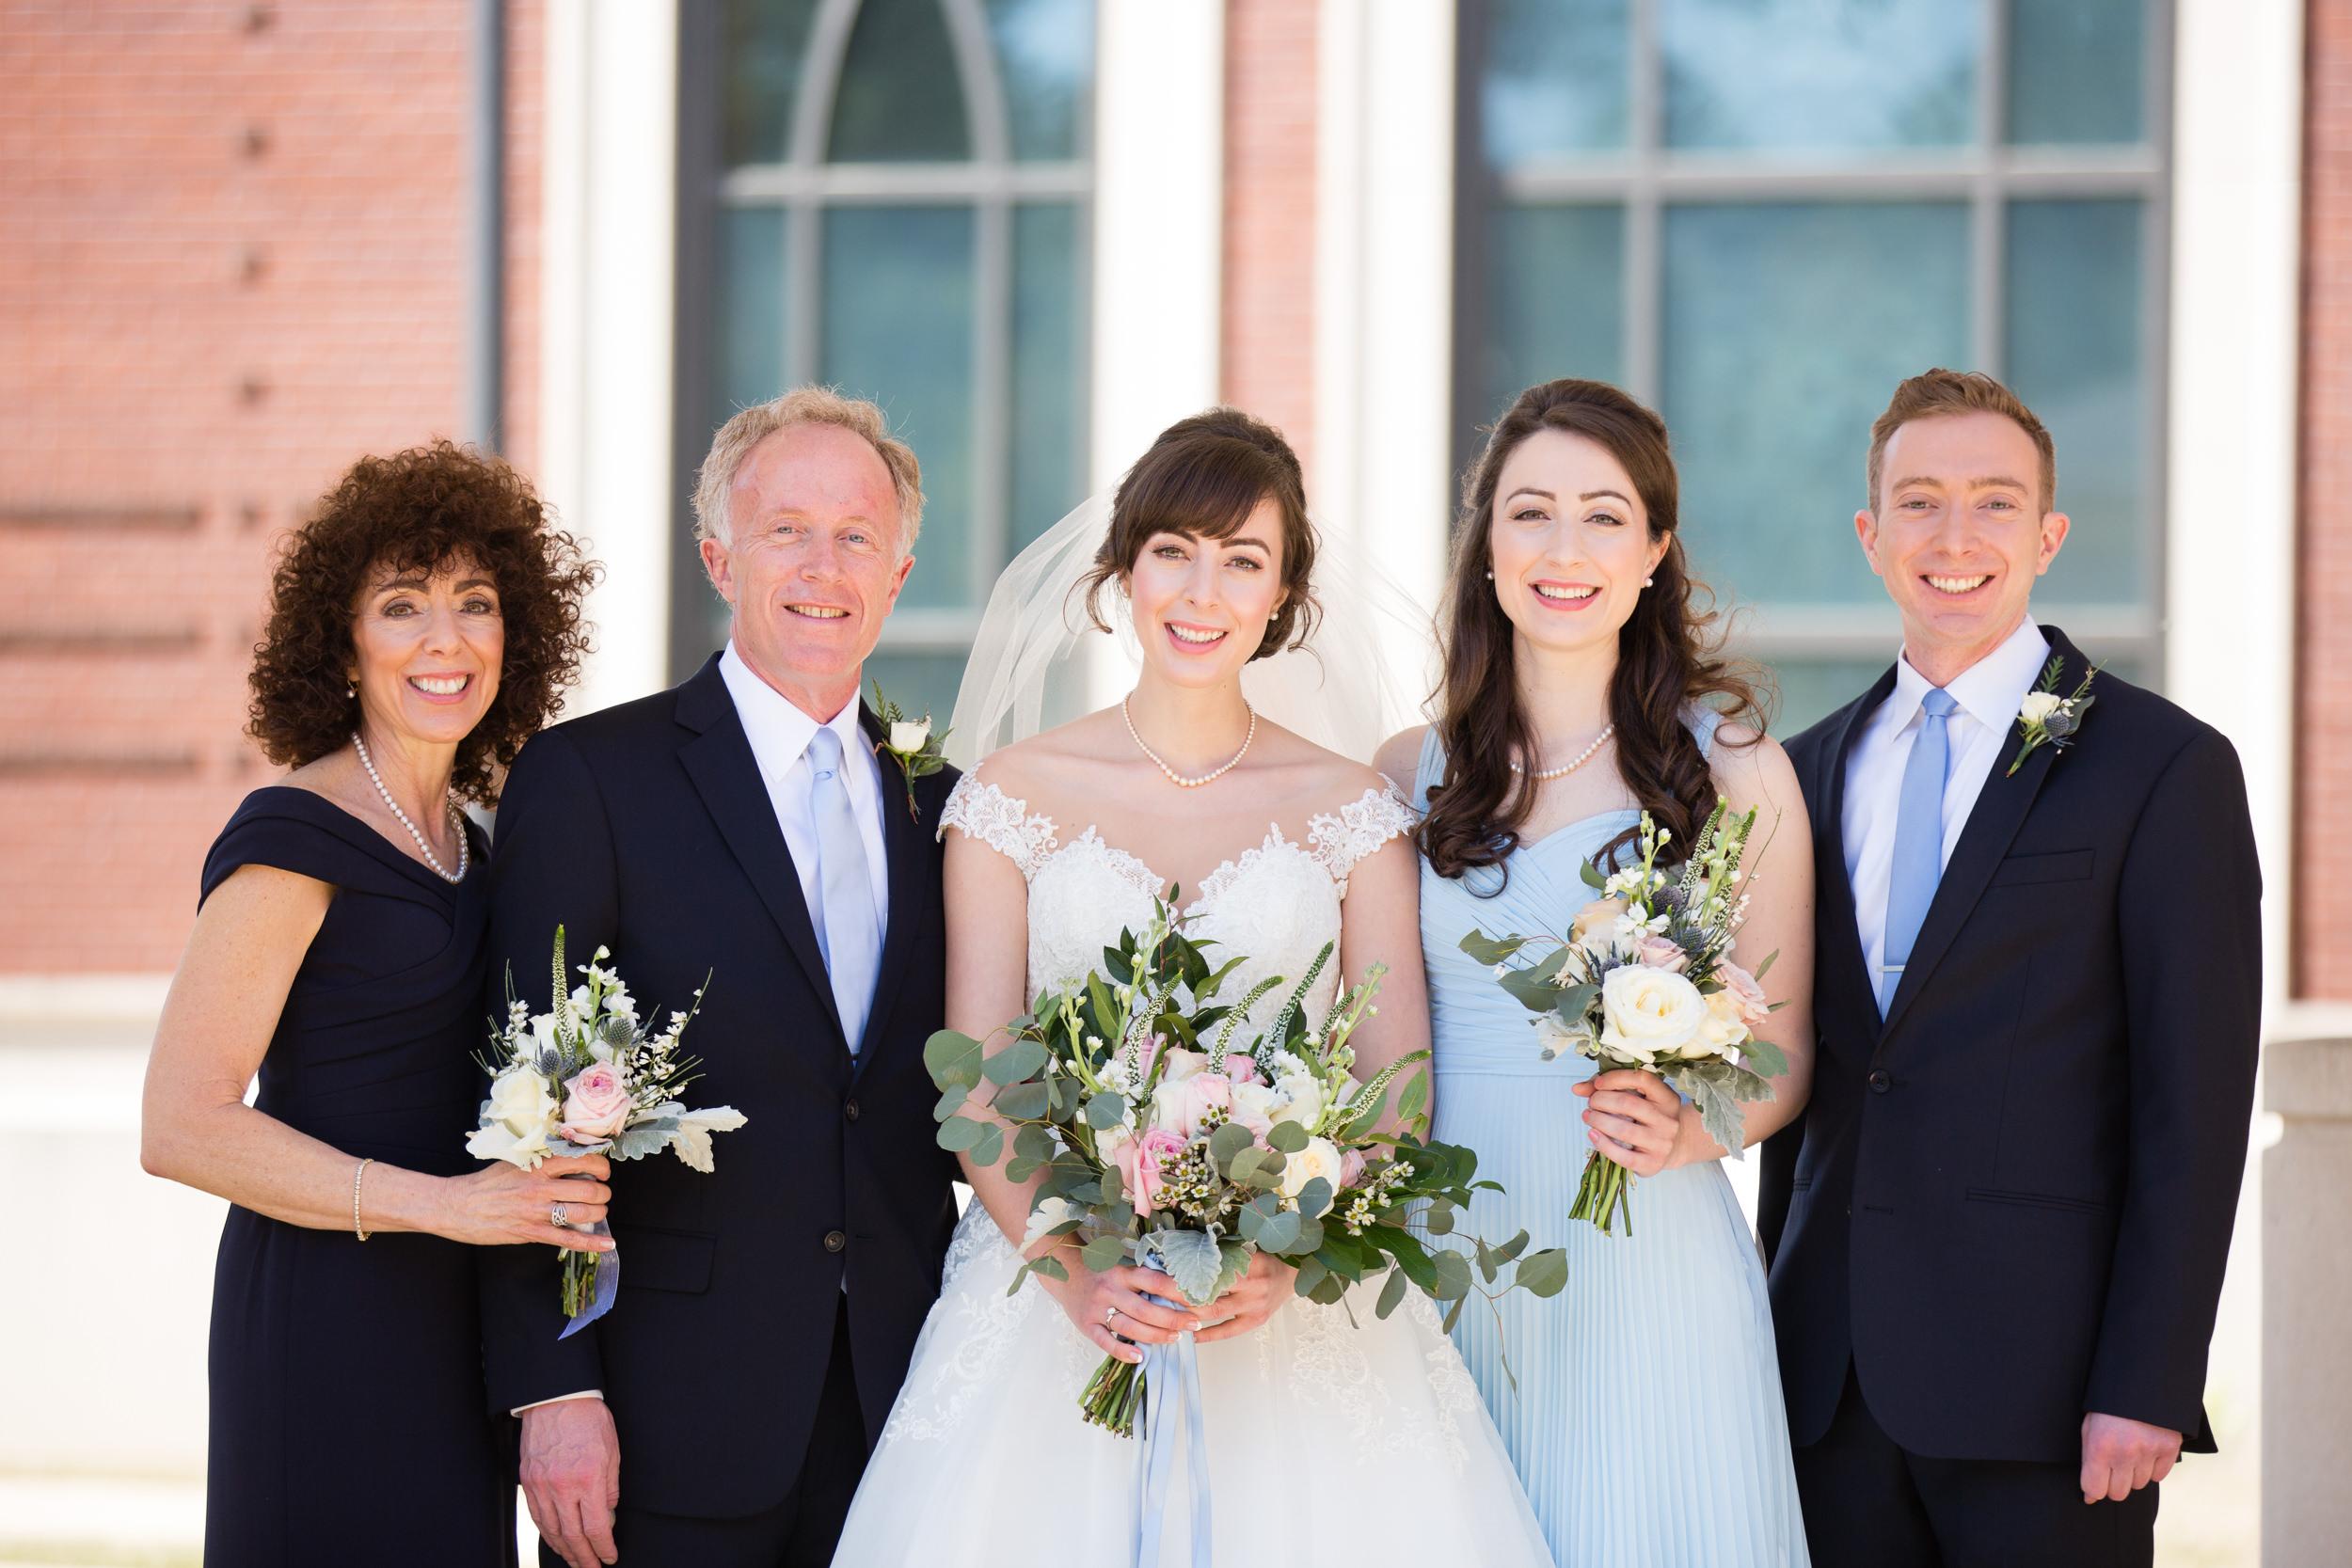 AB_Auburn_Wedding_2019-00021.jpg